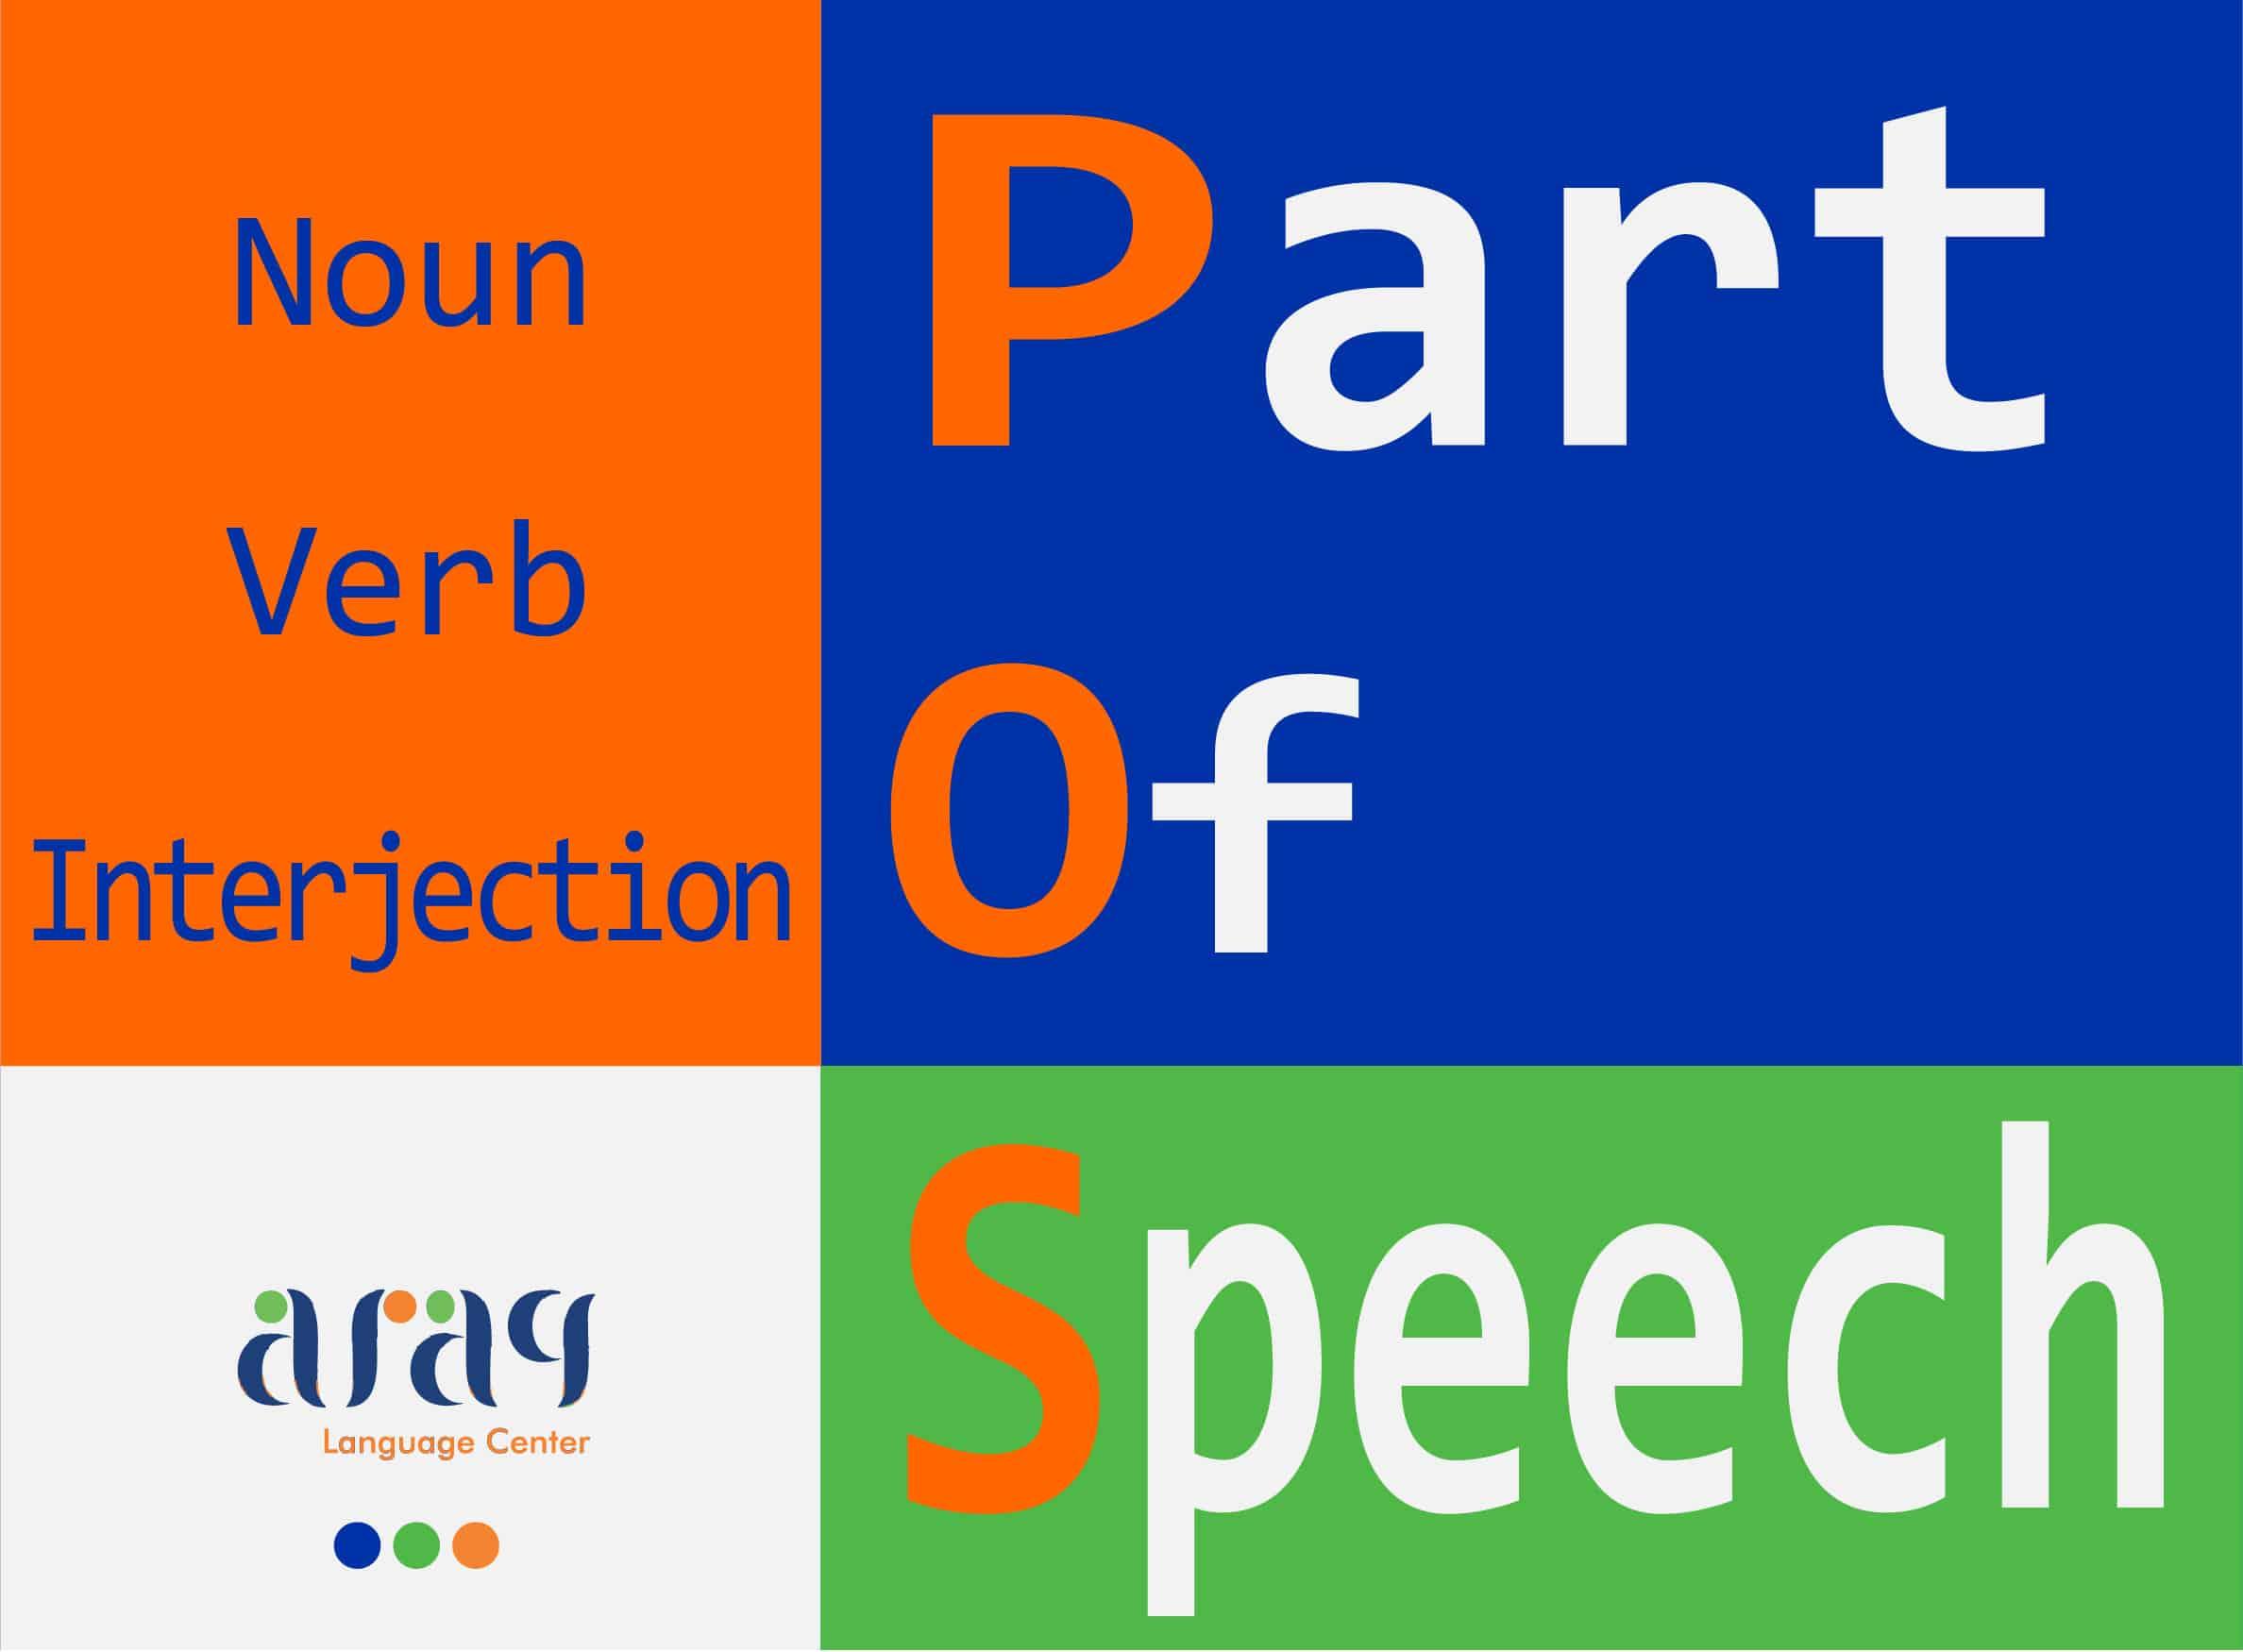 اجزای کلام بخش اول شامل اسم فعل حرف ندا